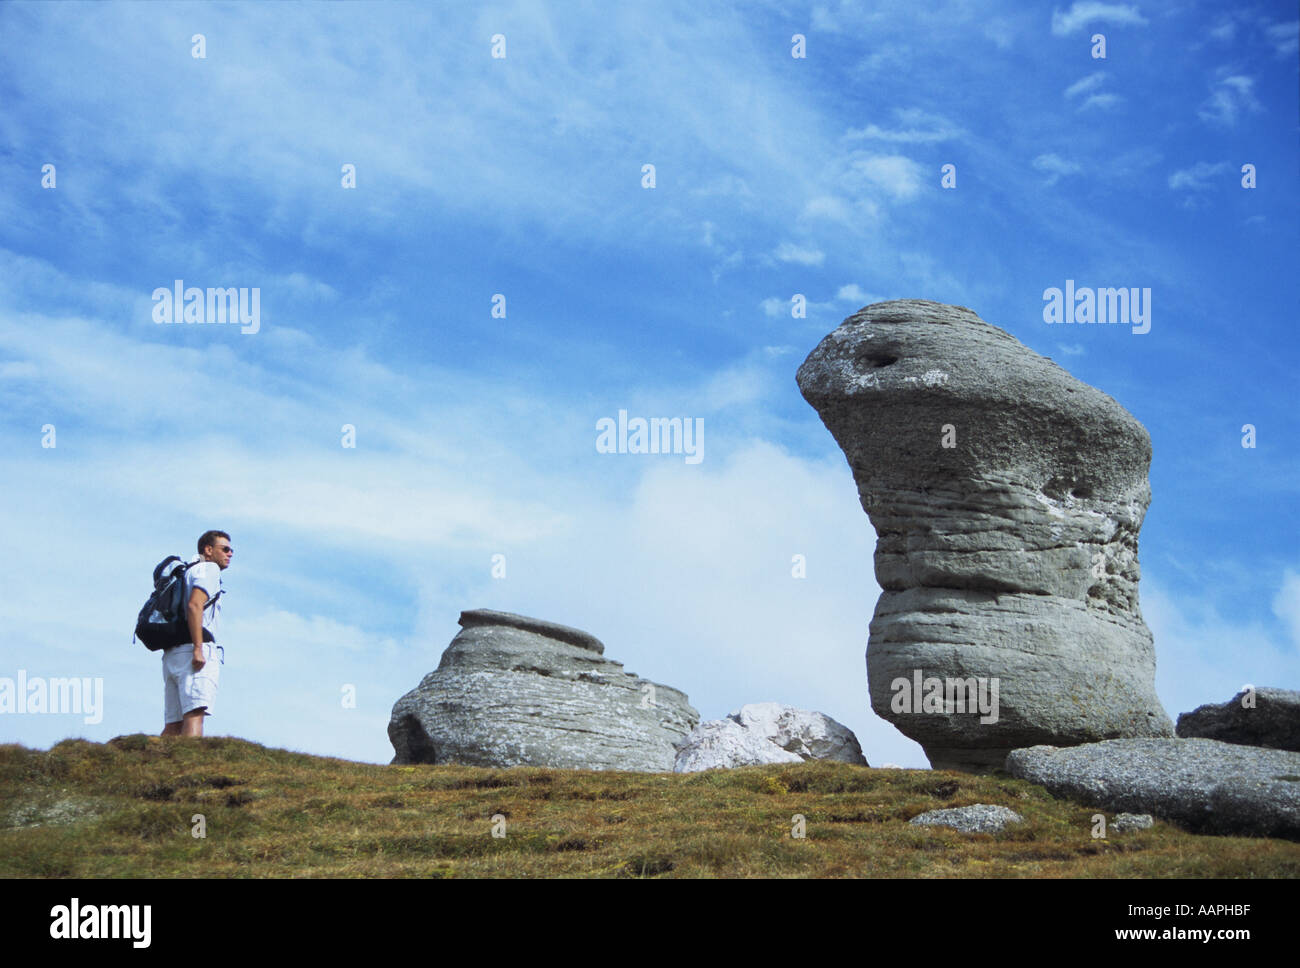 Walking amongst rock formations in the Bucegi mountains Romania Stock Photo